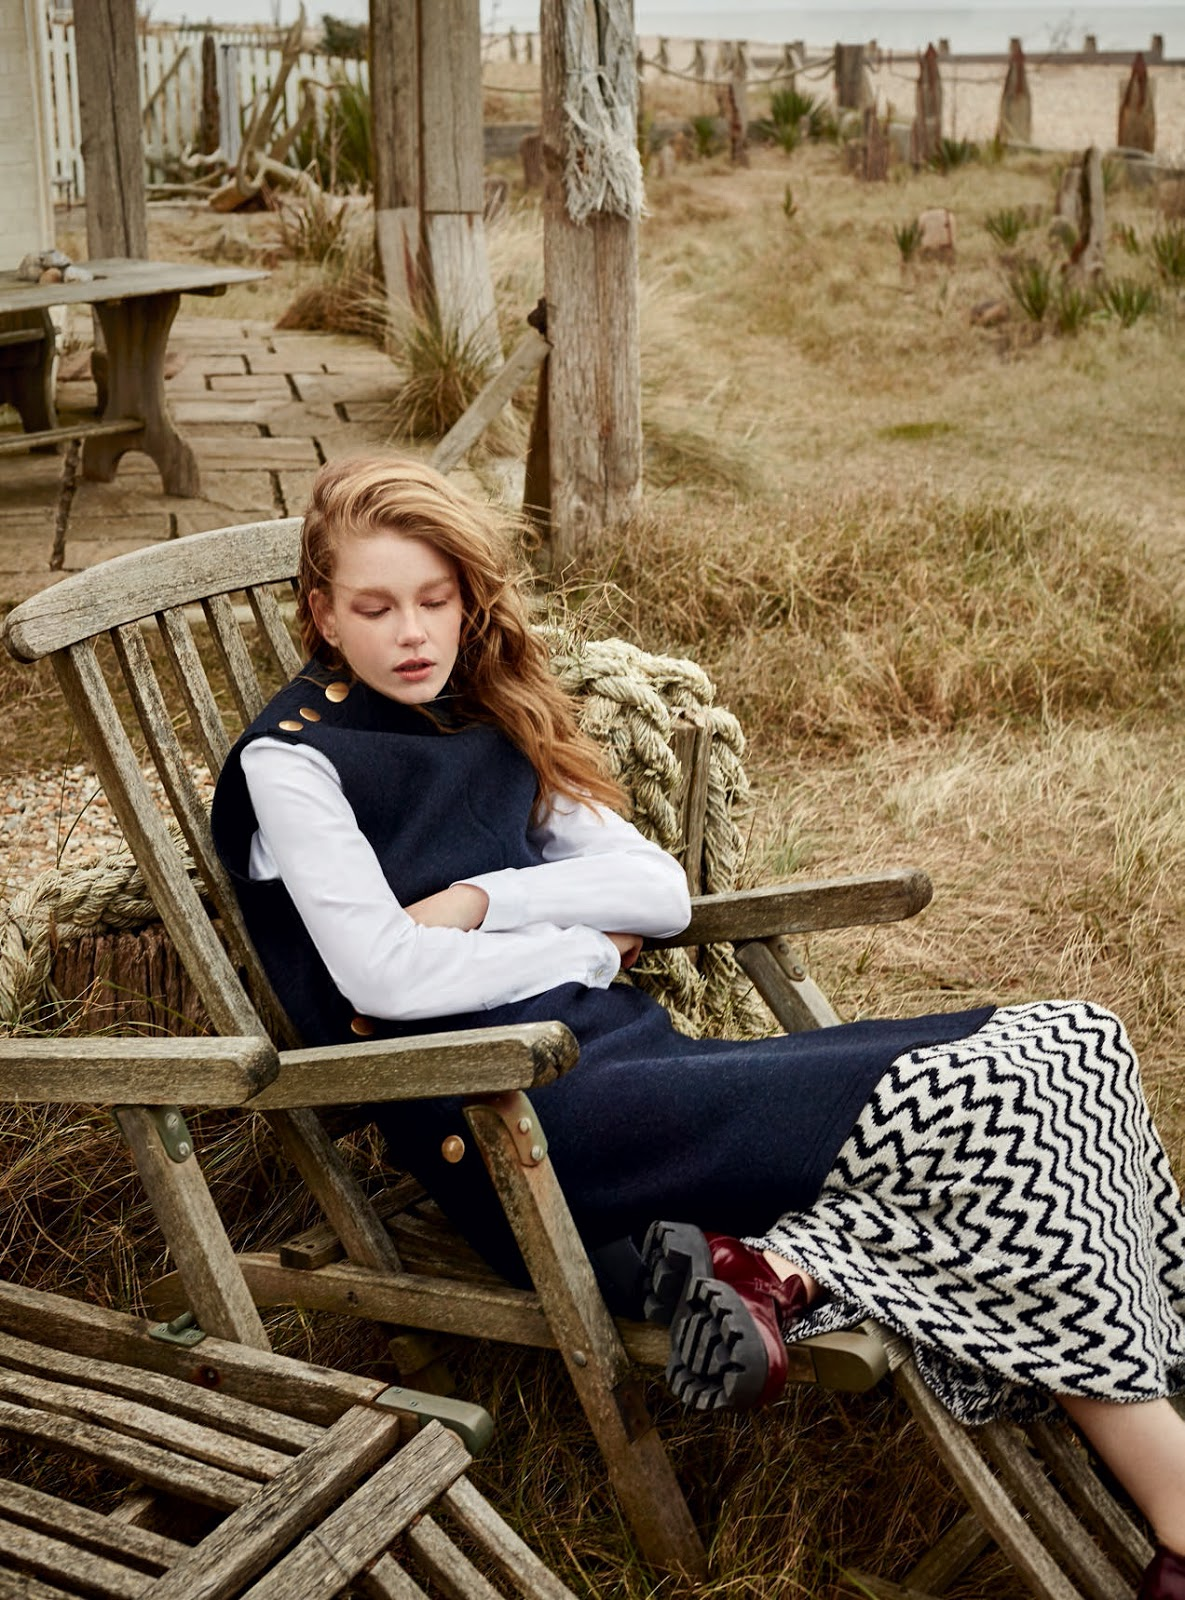 Hollie-May Saker by Agata Pospieszynska for Harper's Bazaar UK July 2016